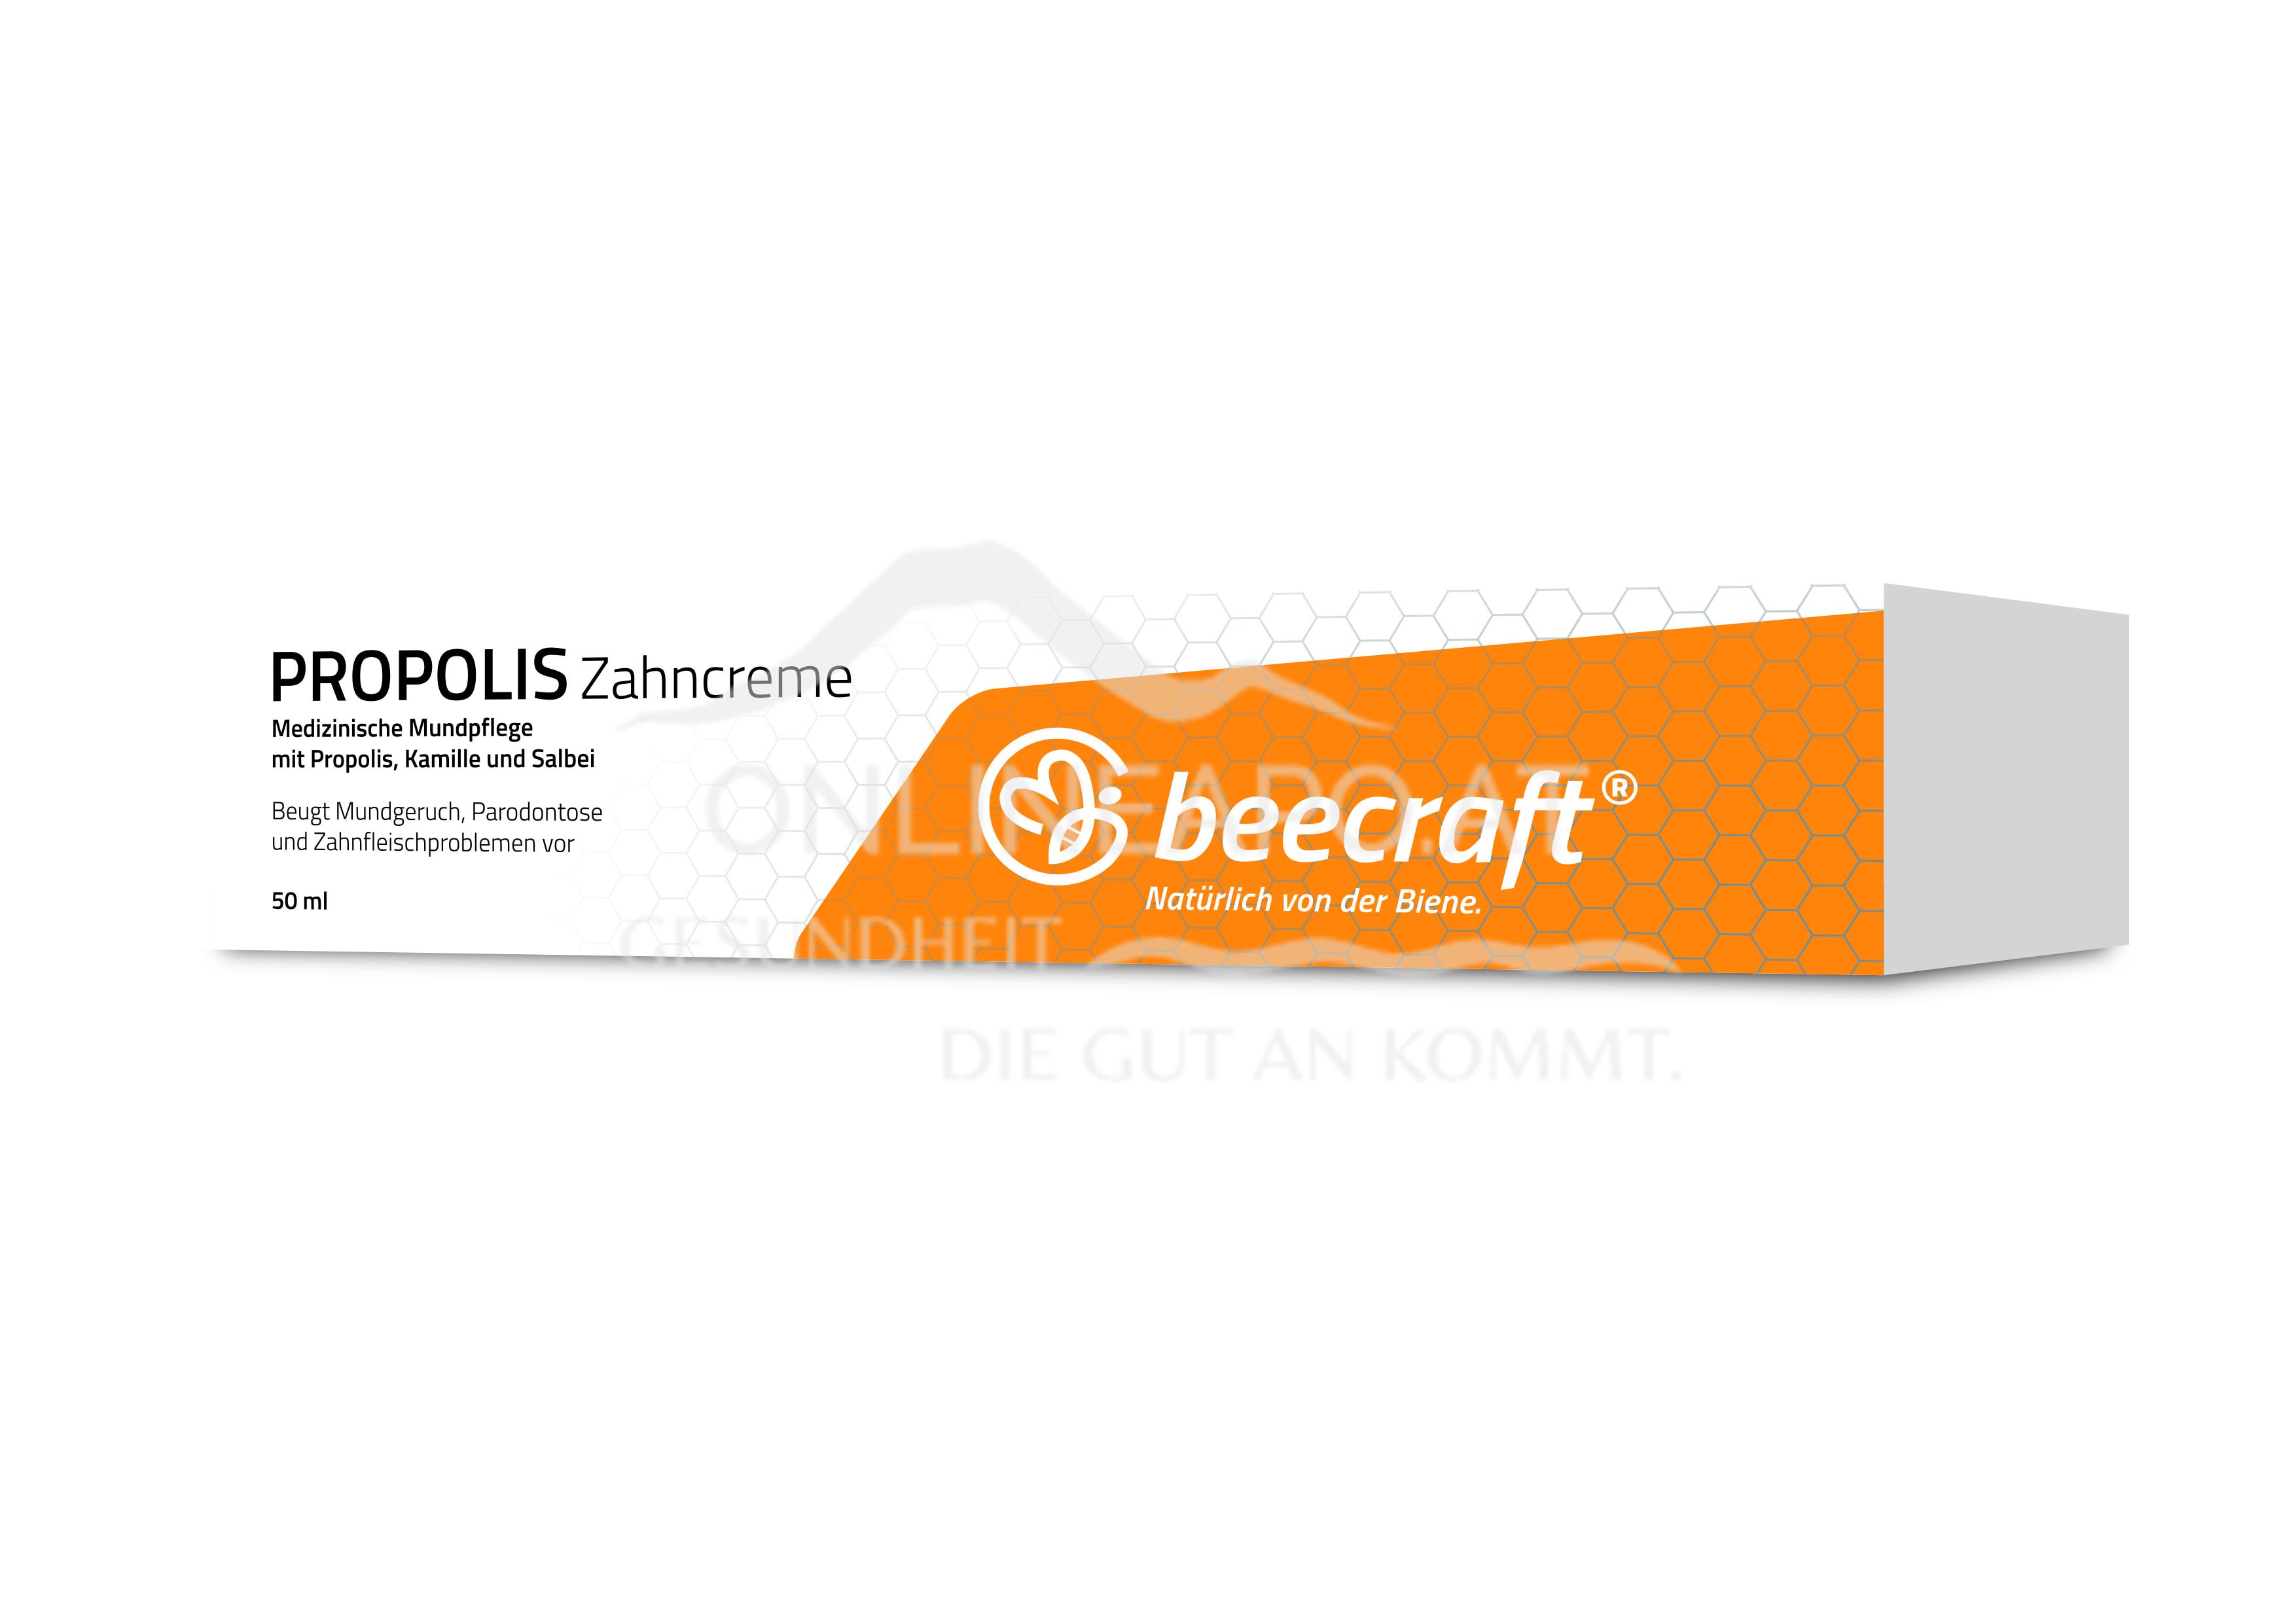 beecraft® Propolis Zahncreme